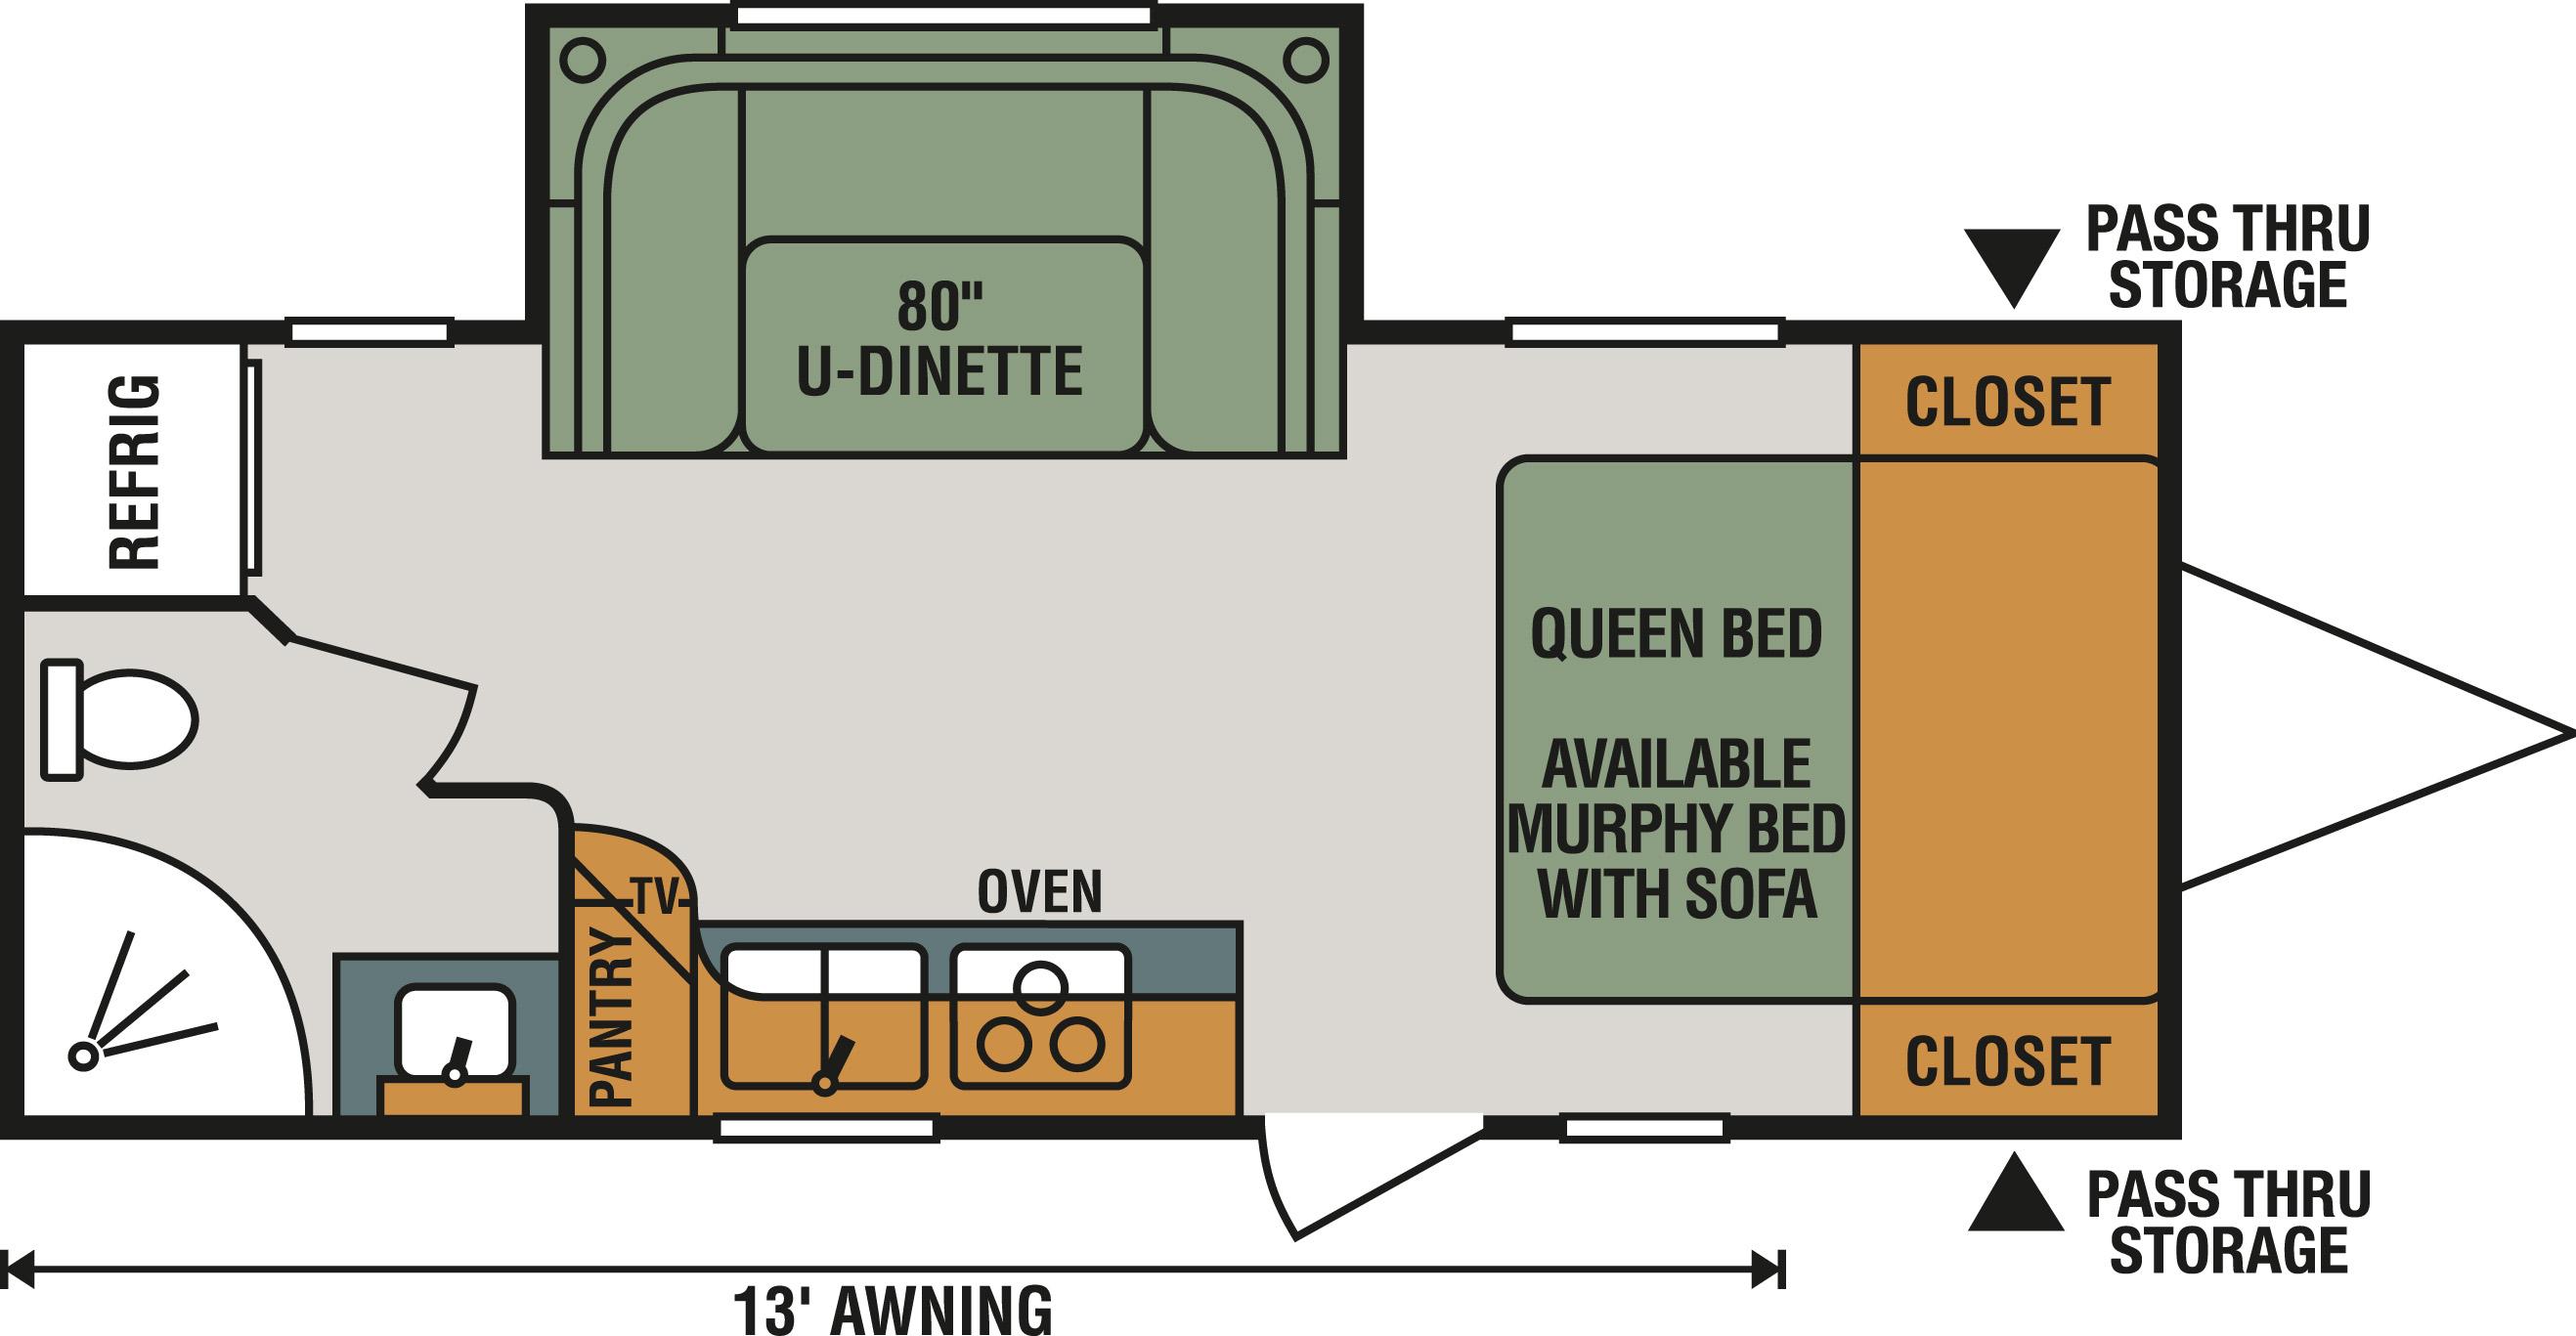 terry travel trailer wiring diagram 2006 jeep tj radio aerolite rv electrical schematic